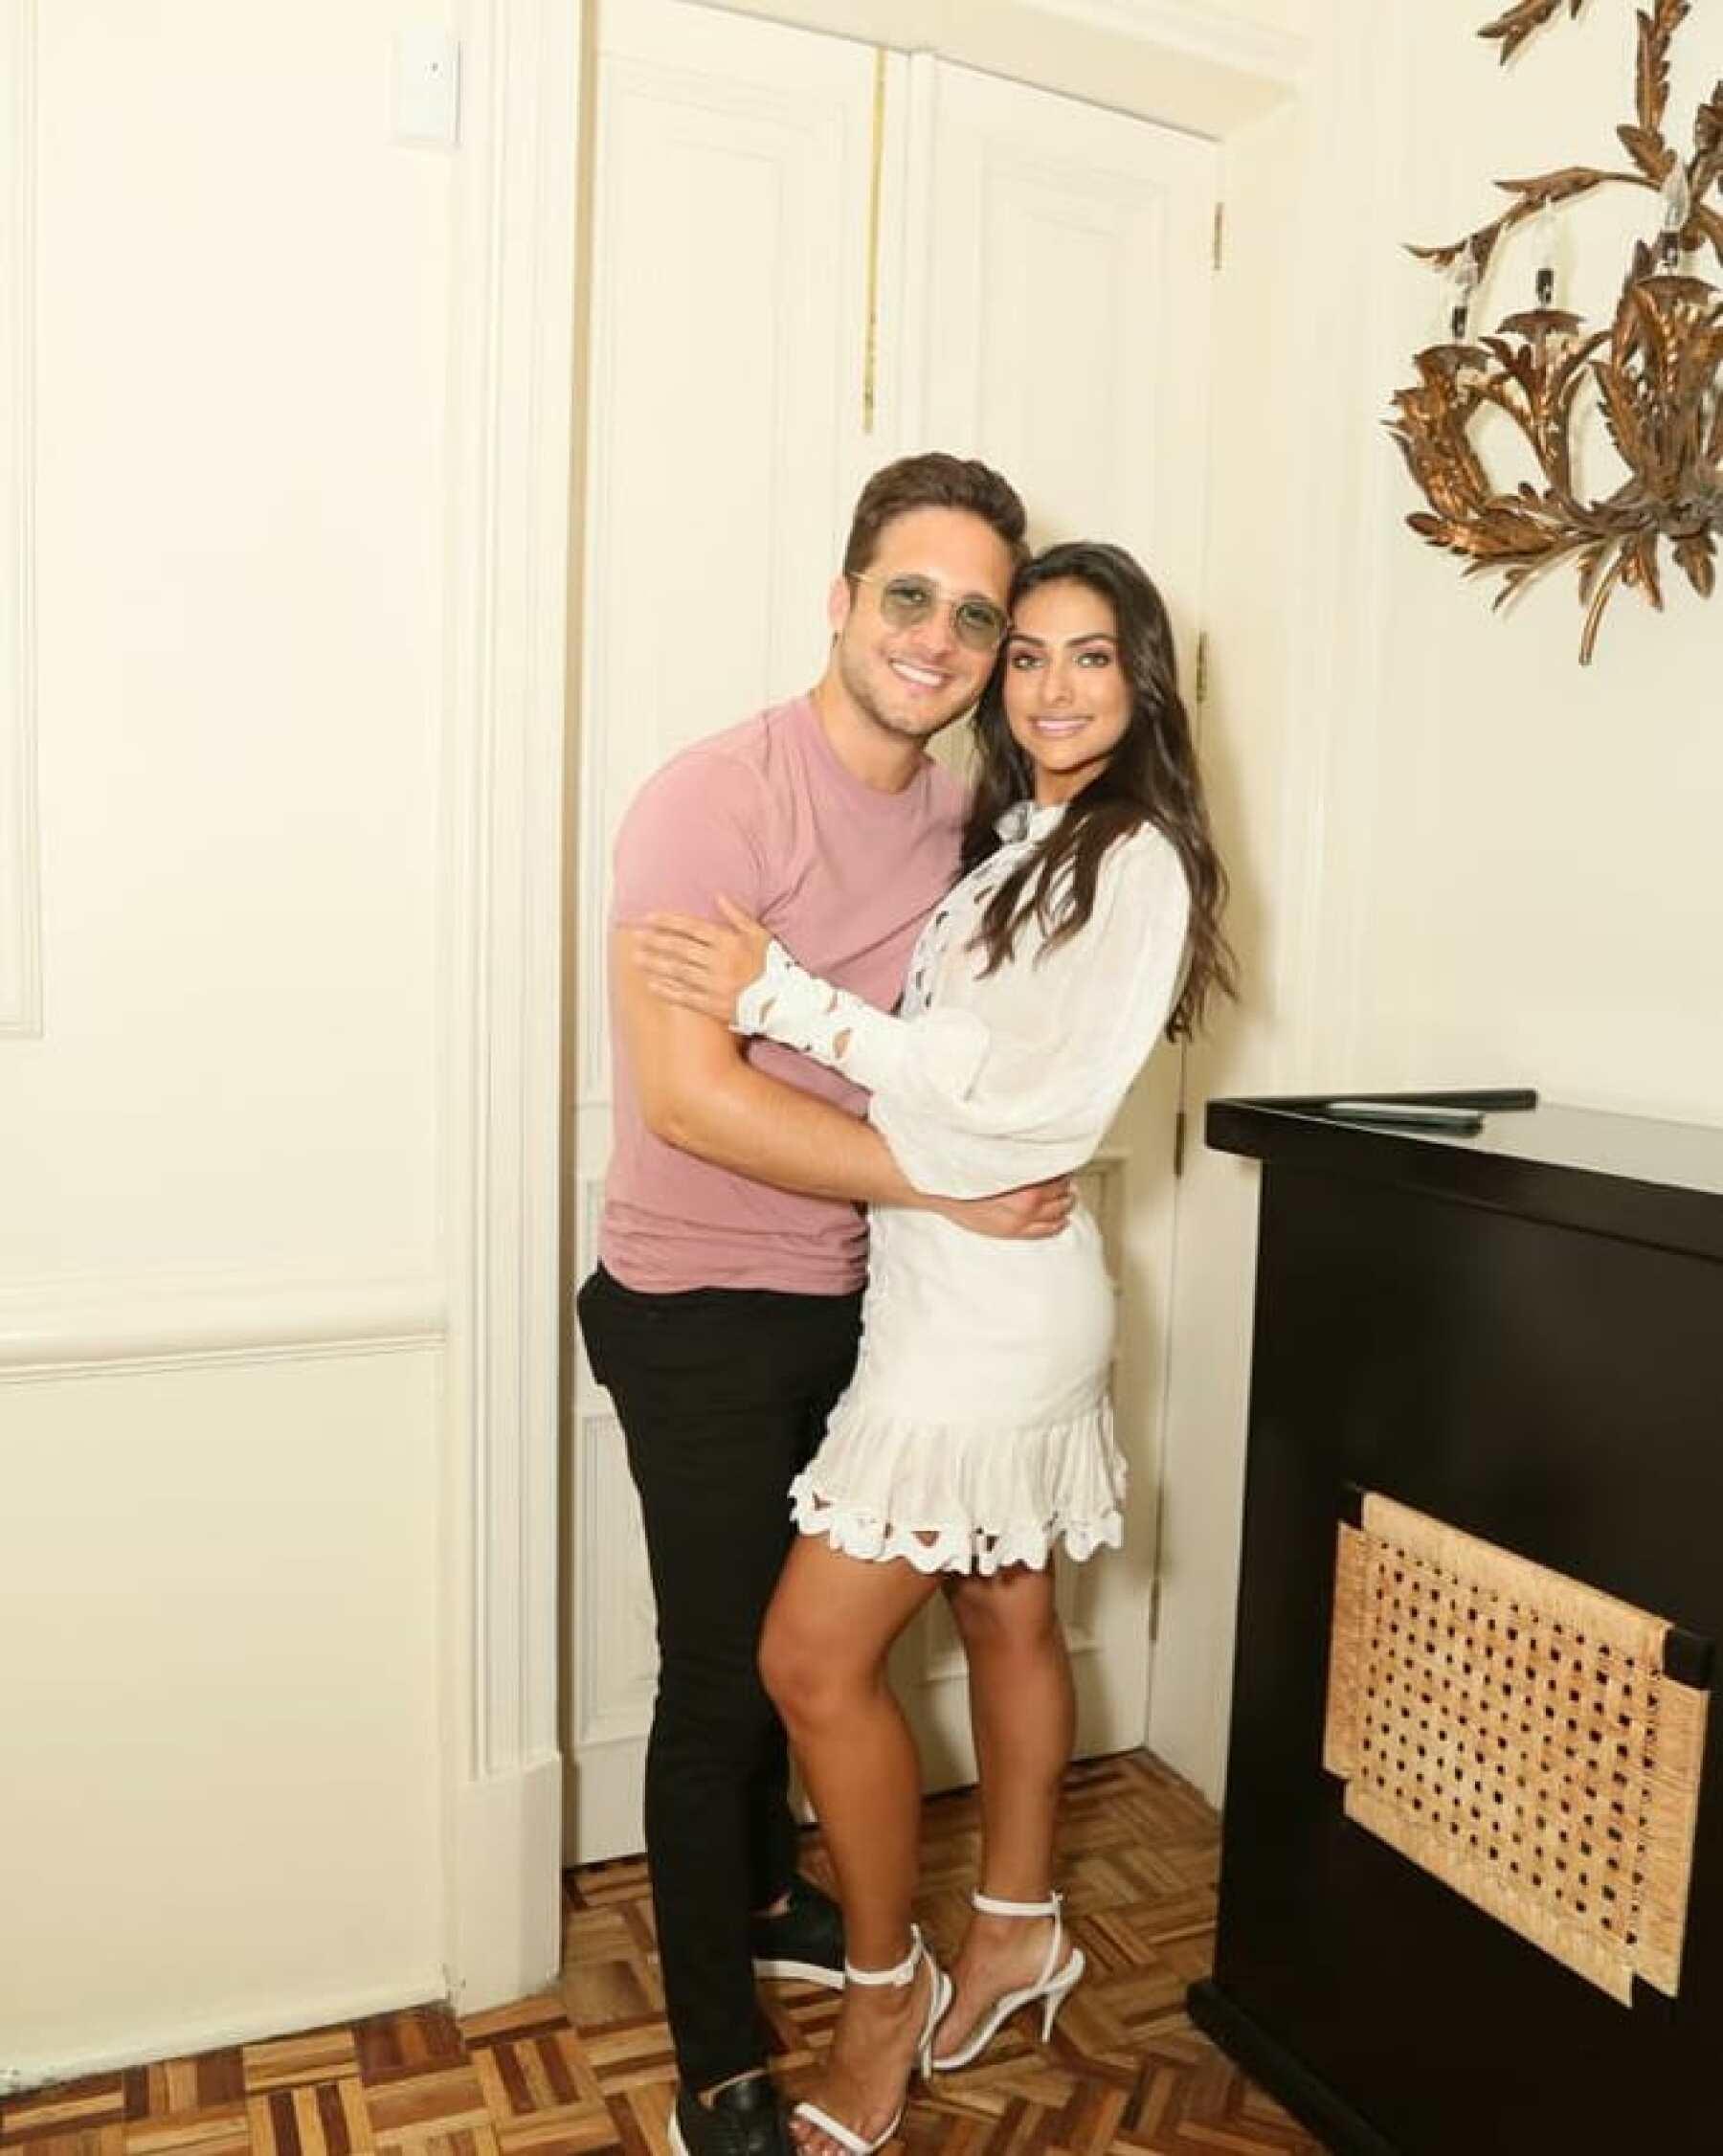 Exclusiva: Diego Boneta y Renata Notni posan juntos por primera vez